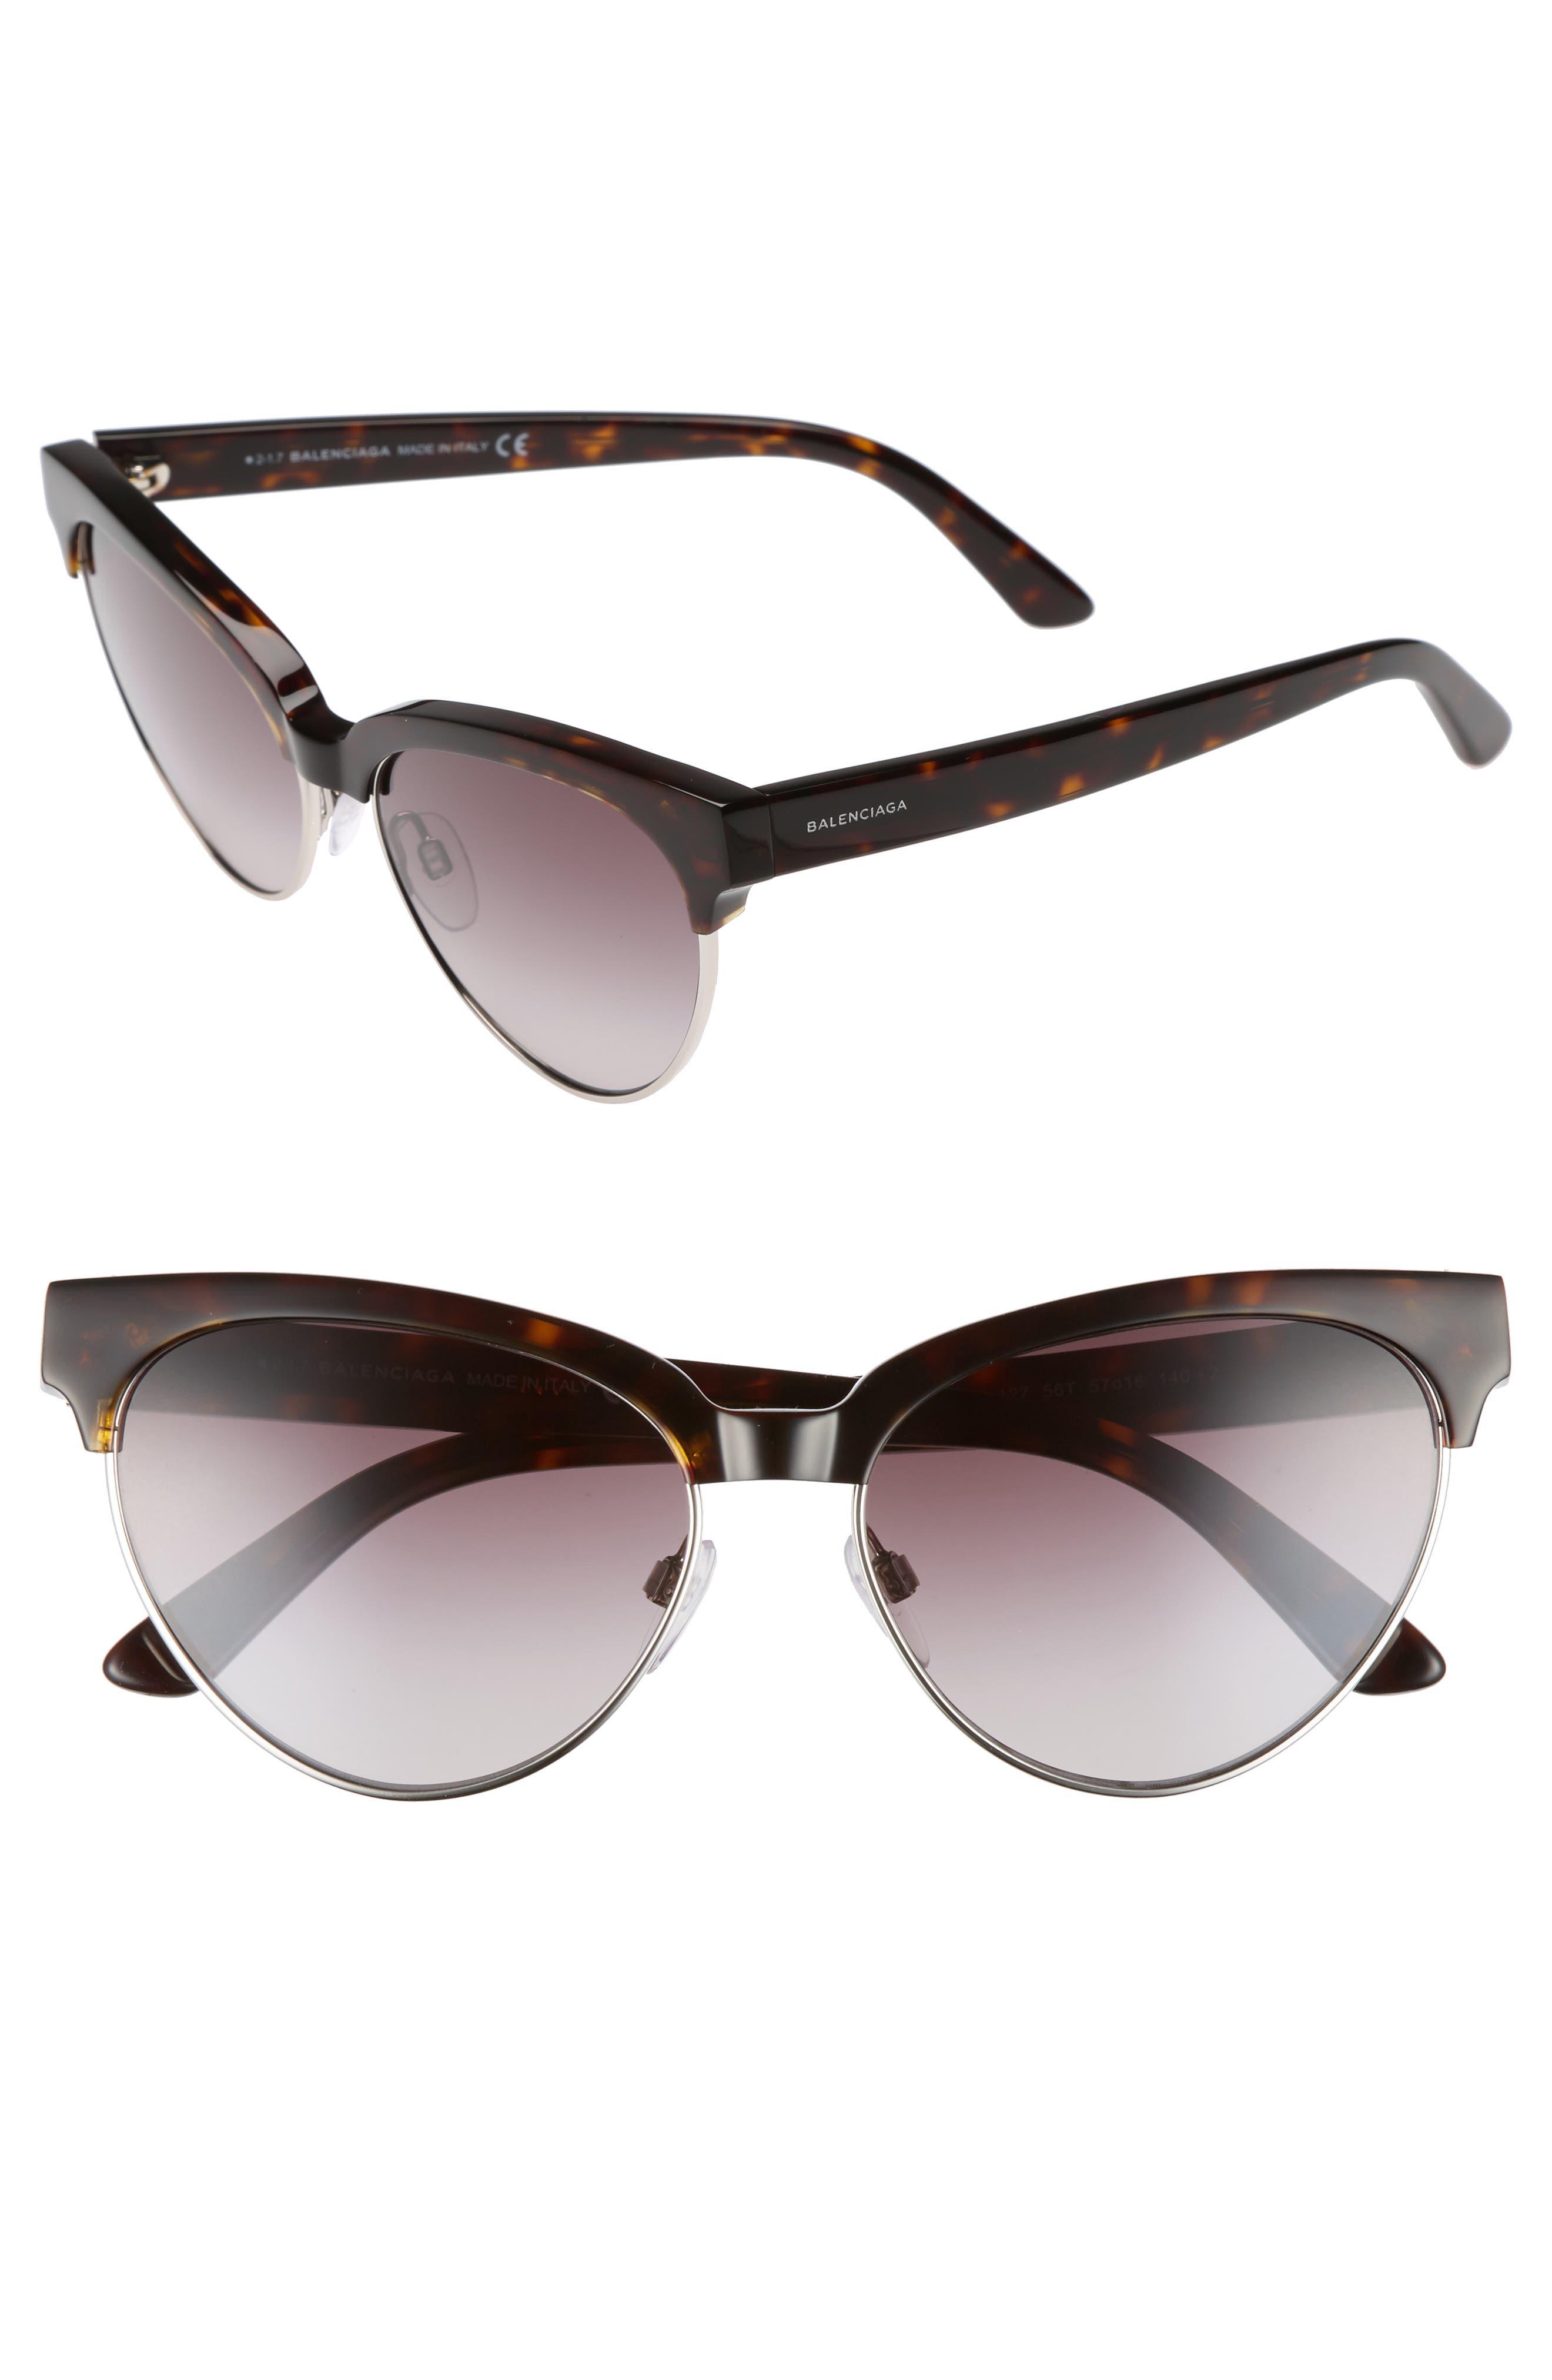 Main Image - Balenciaga 57mm Gradient Cat Eye Sunglasses